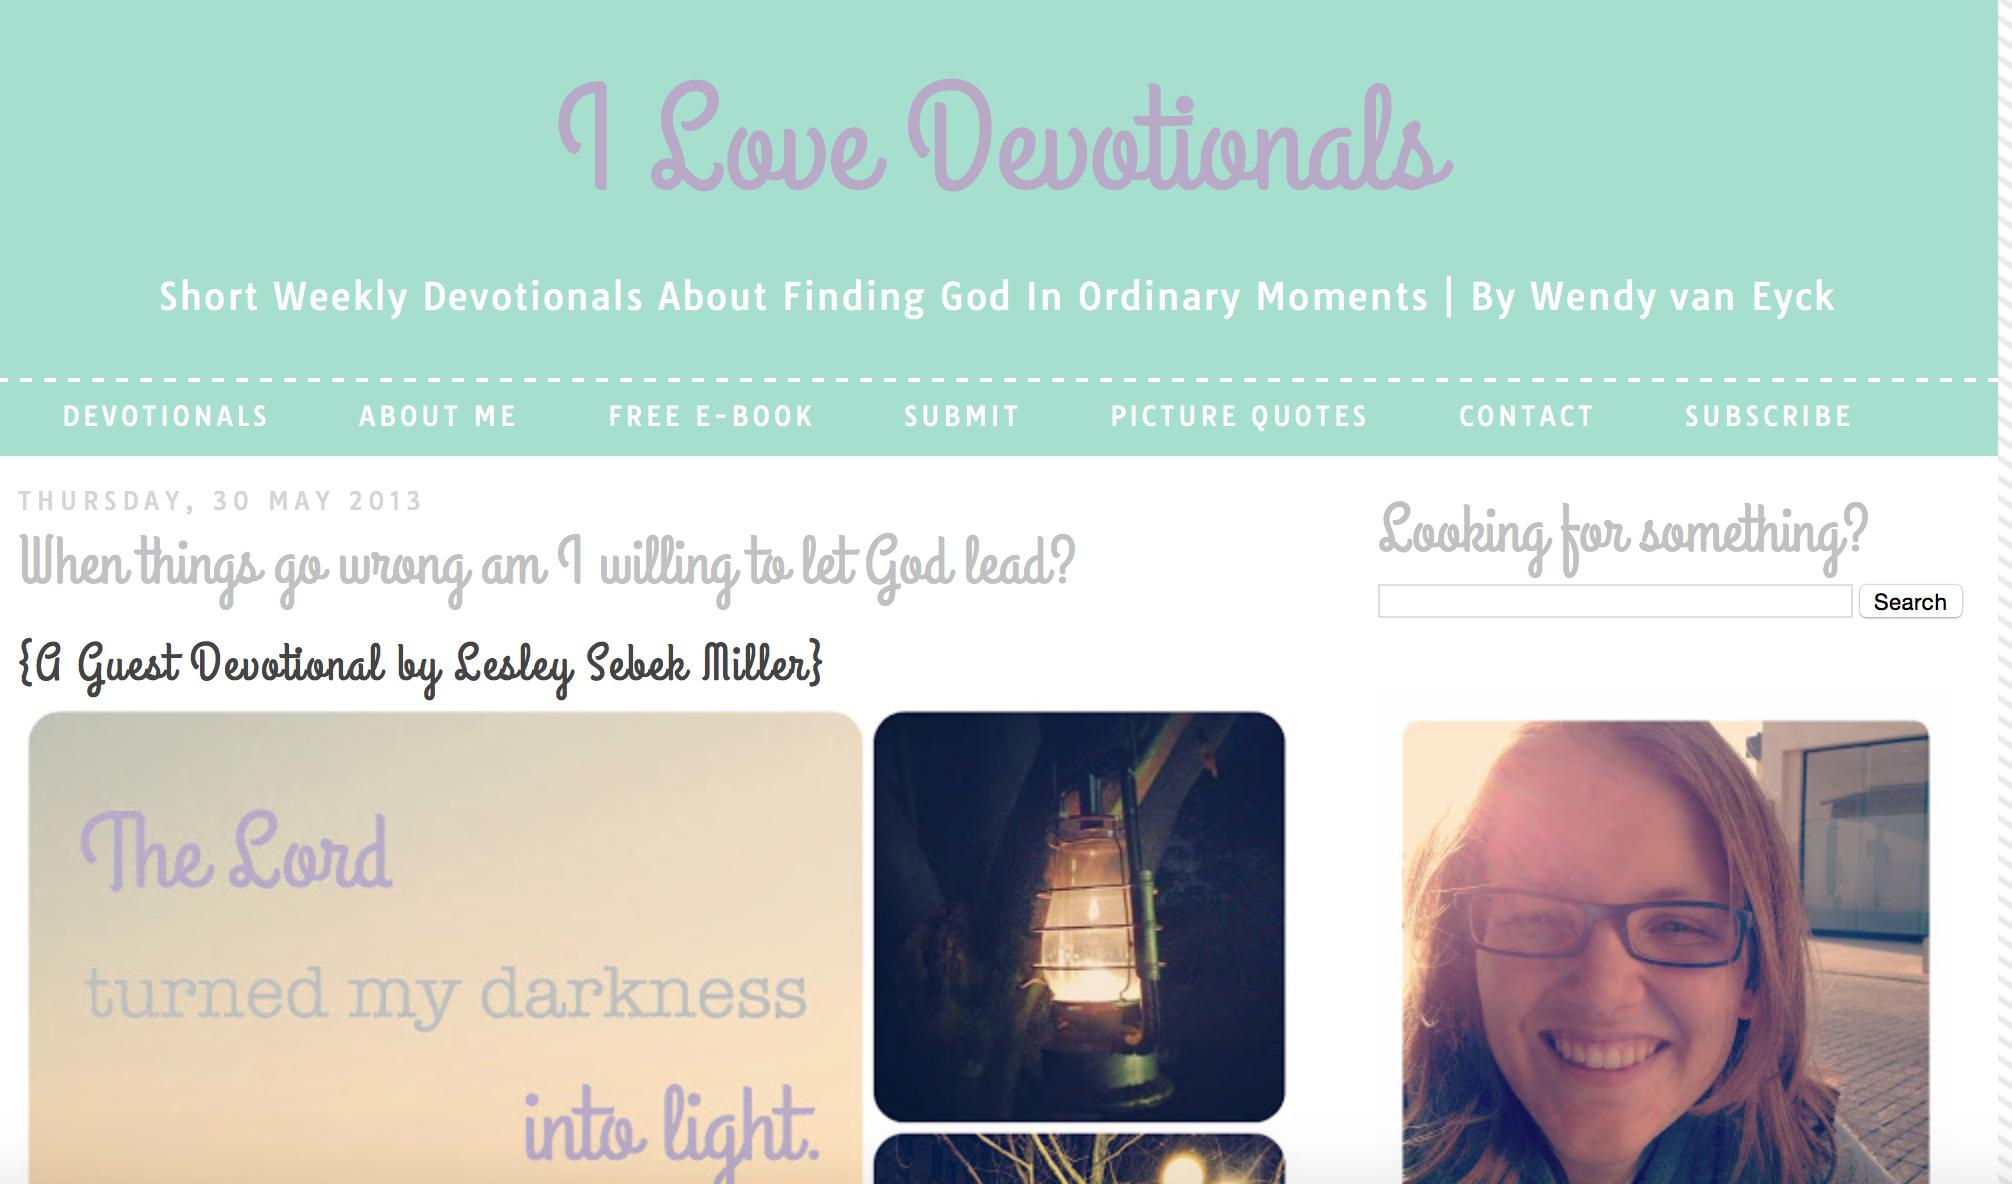 Ilovedevotionals.com